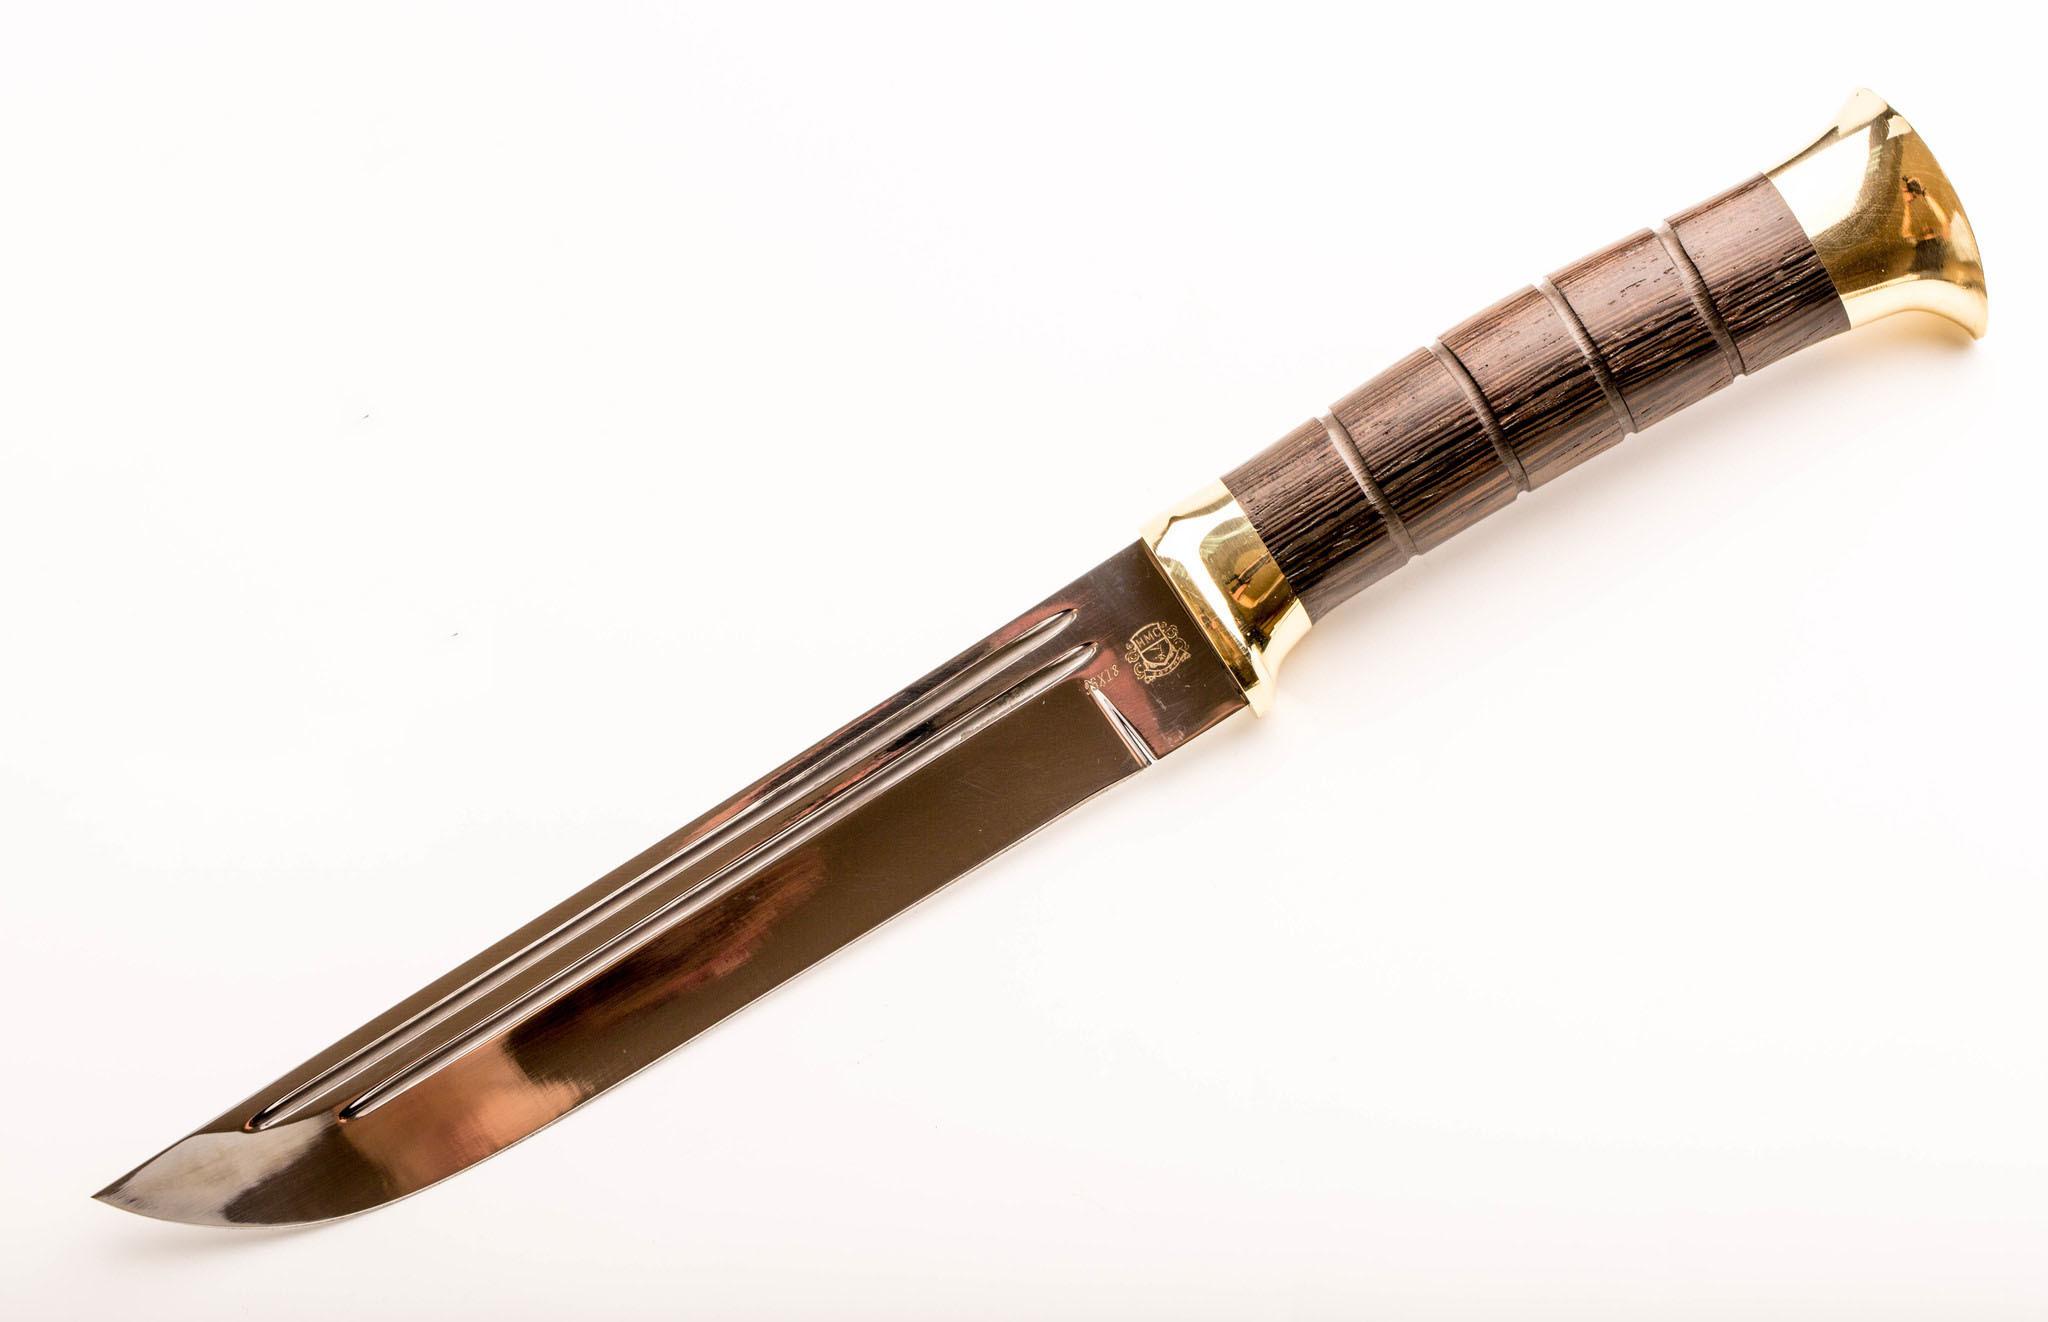 Нож Пластунский малый, сталь 95Х18, рукоять венге